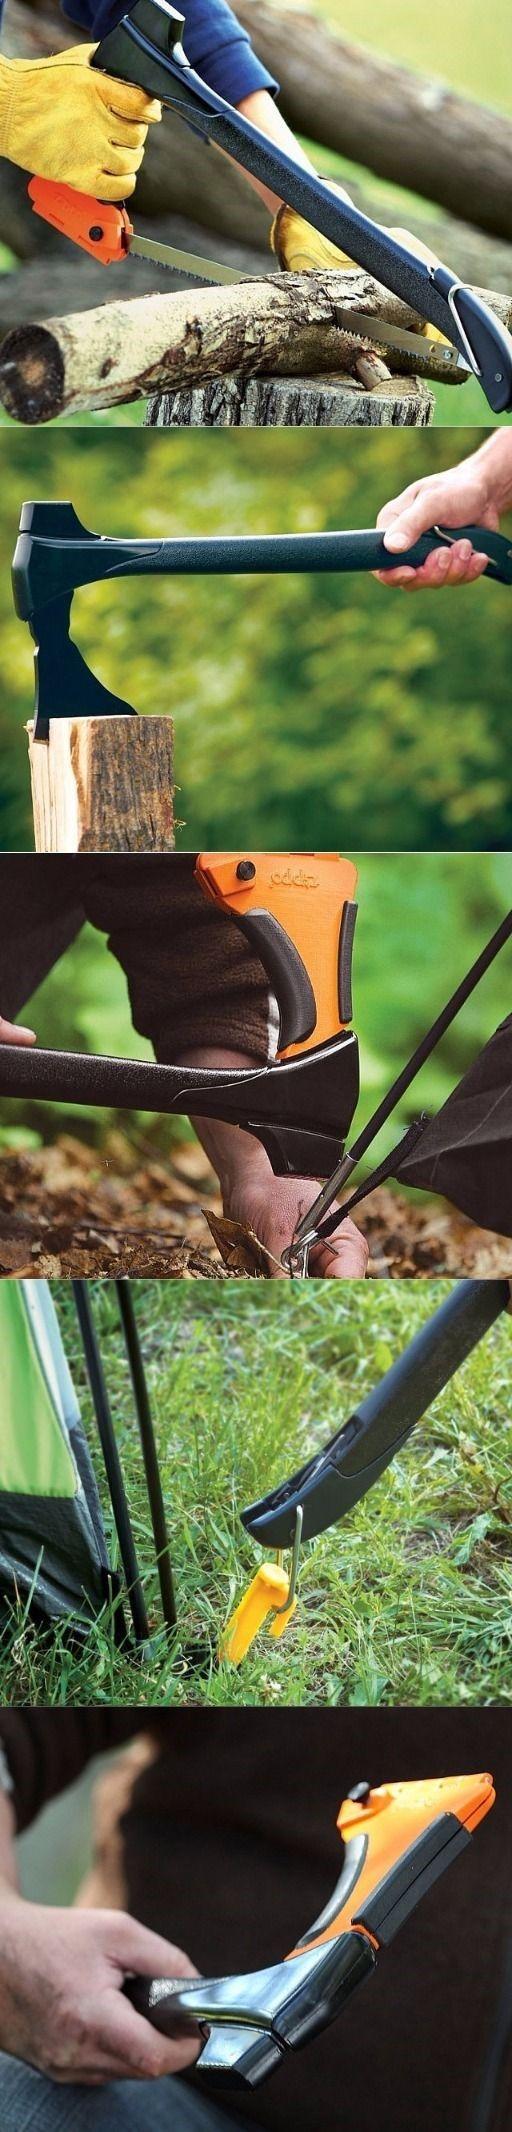 Zippo 4-In-1 Woodsman Multi Tool Axe, Saw, Mallet Survival Multi Tool Gear AbdulAziz Bukhamseen